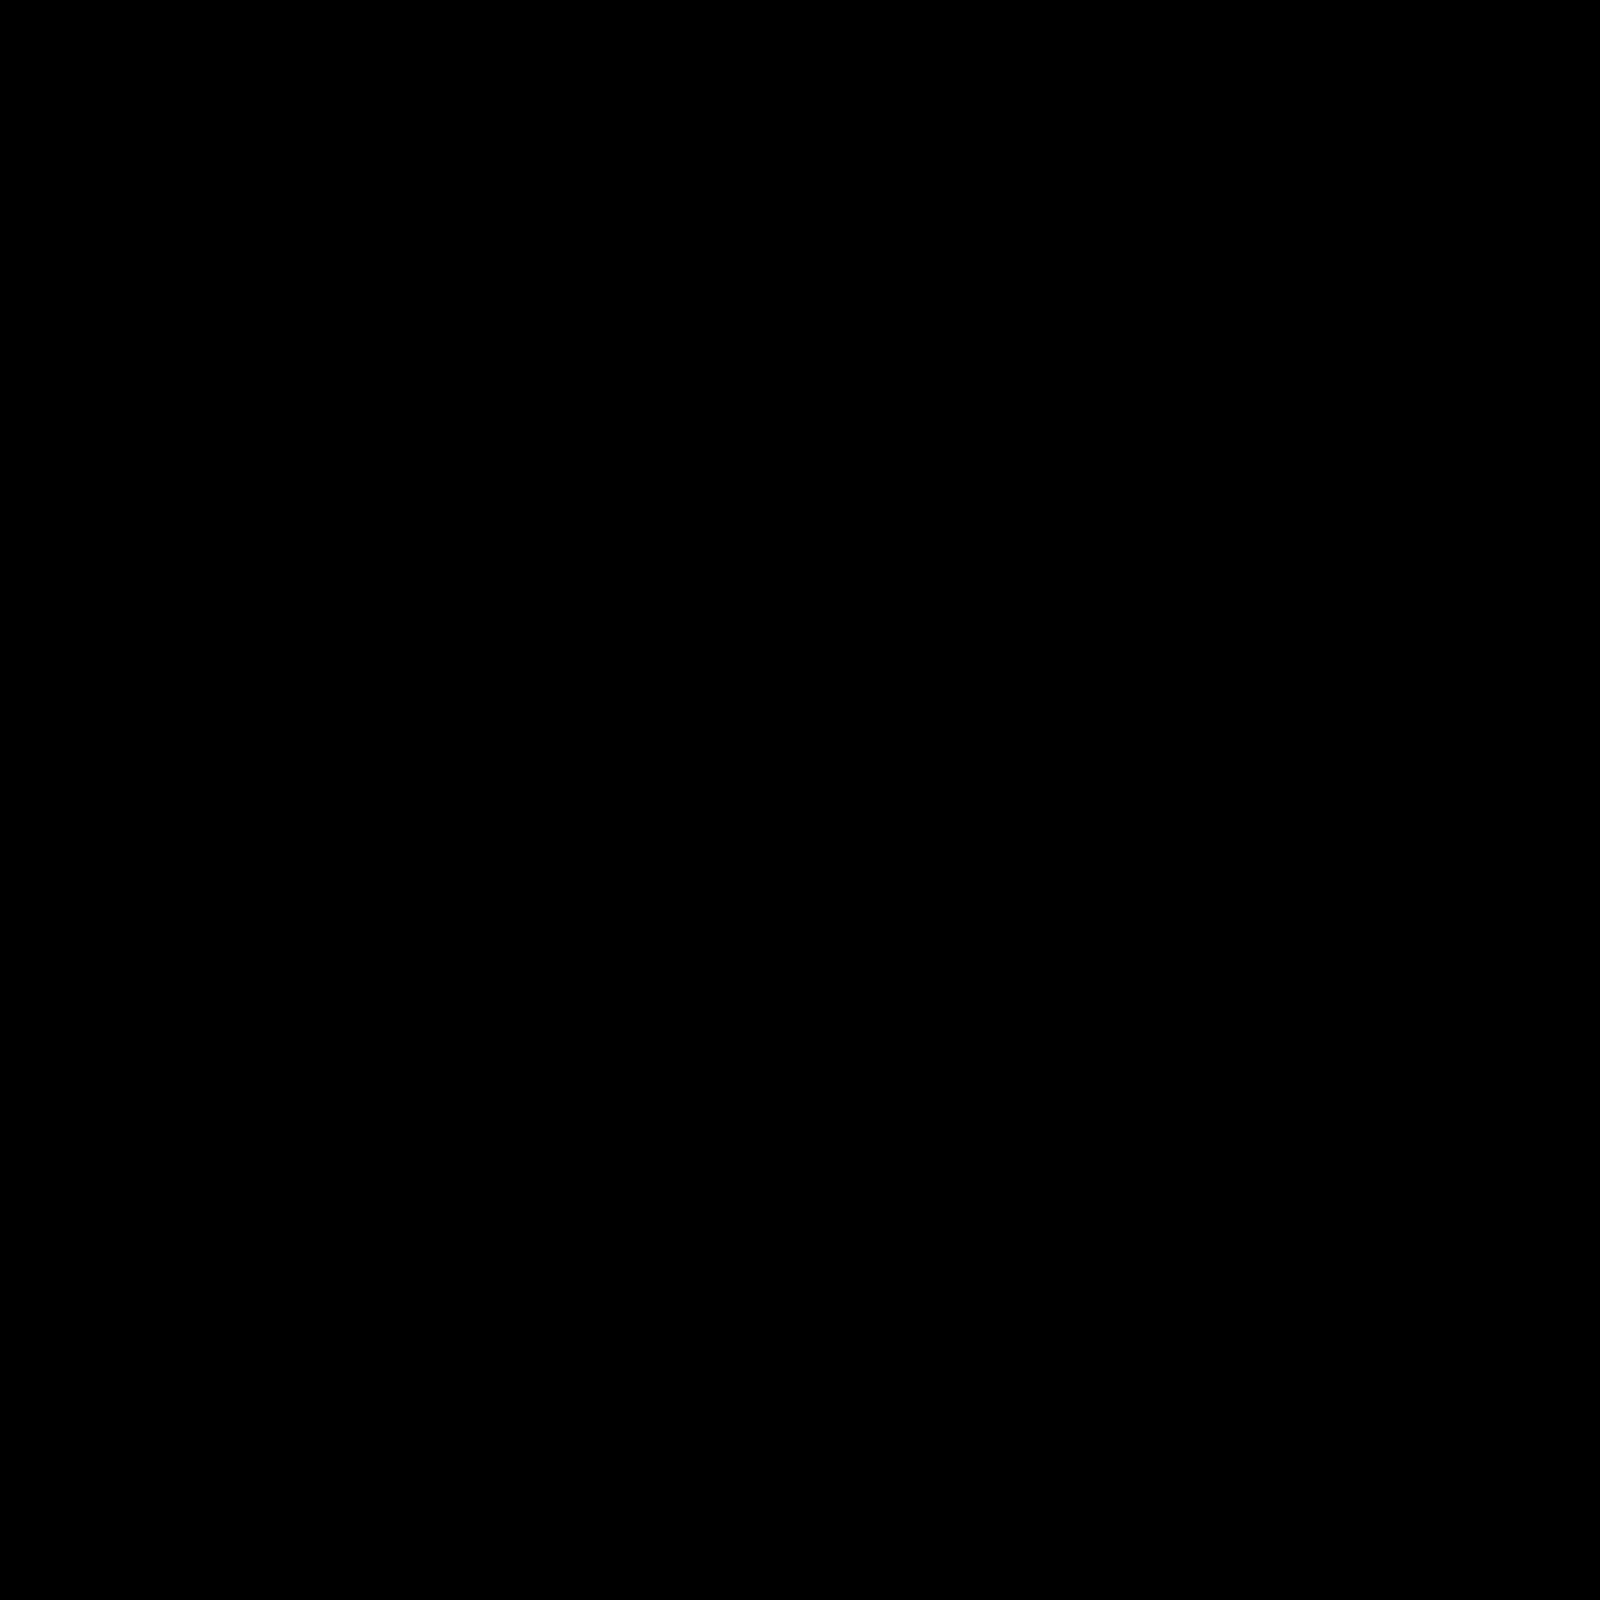 Limuzyna icon